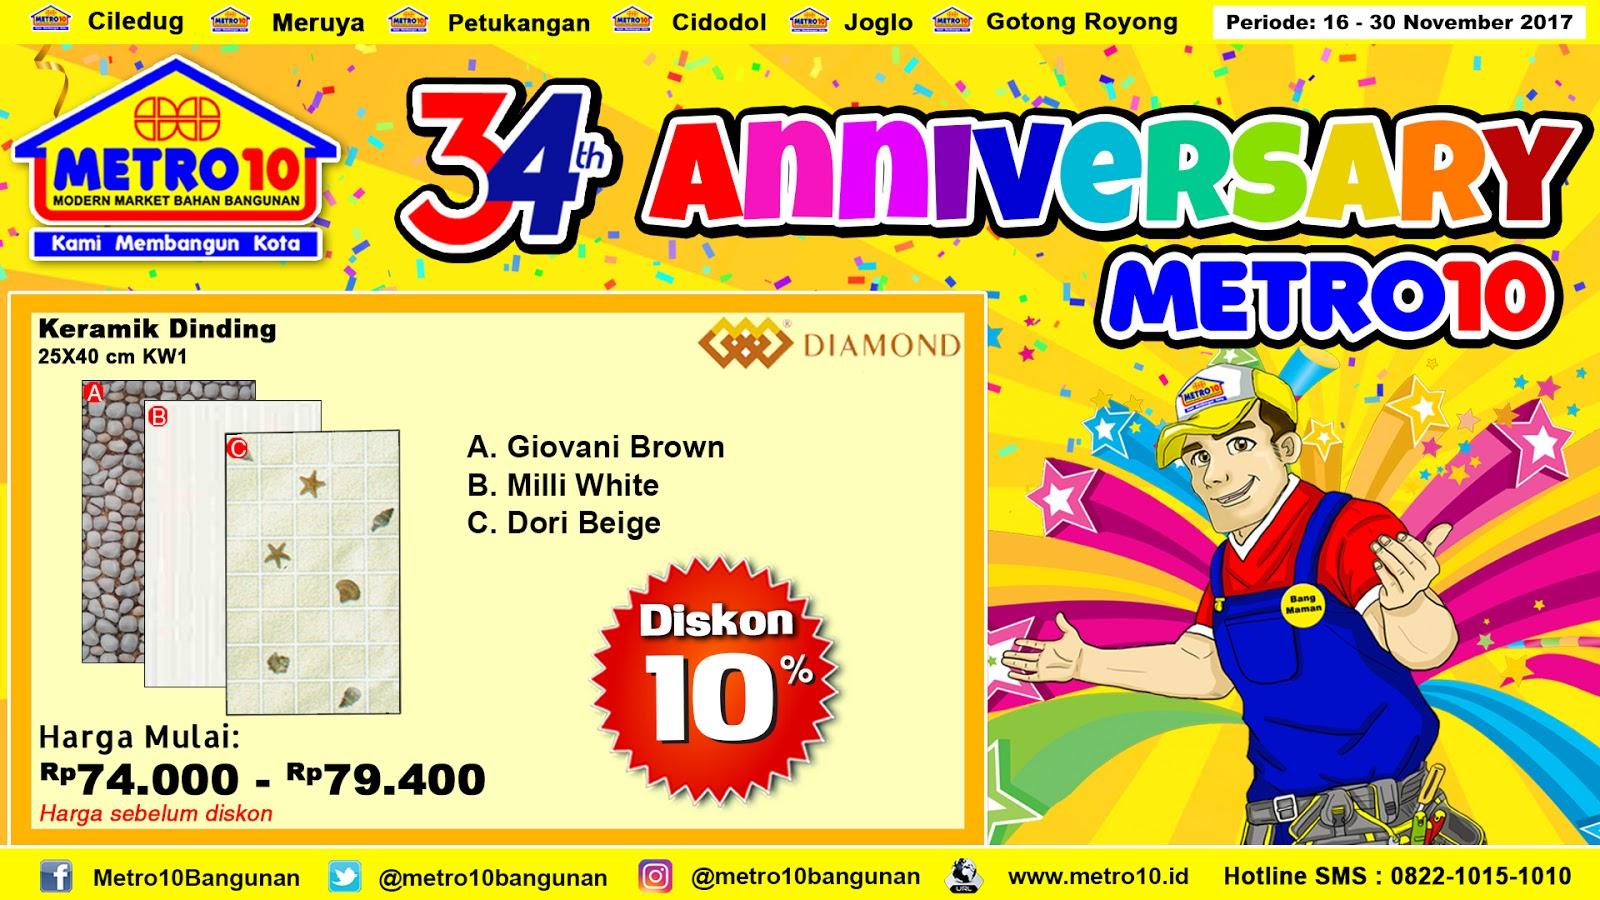 Metro 10 Bangunan November 2017 Semen Perekat Keramik Mastertile 25 25kg Sak Harga Dinding Diamond 25x40cm Kw1